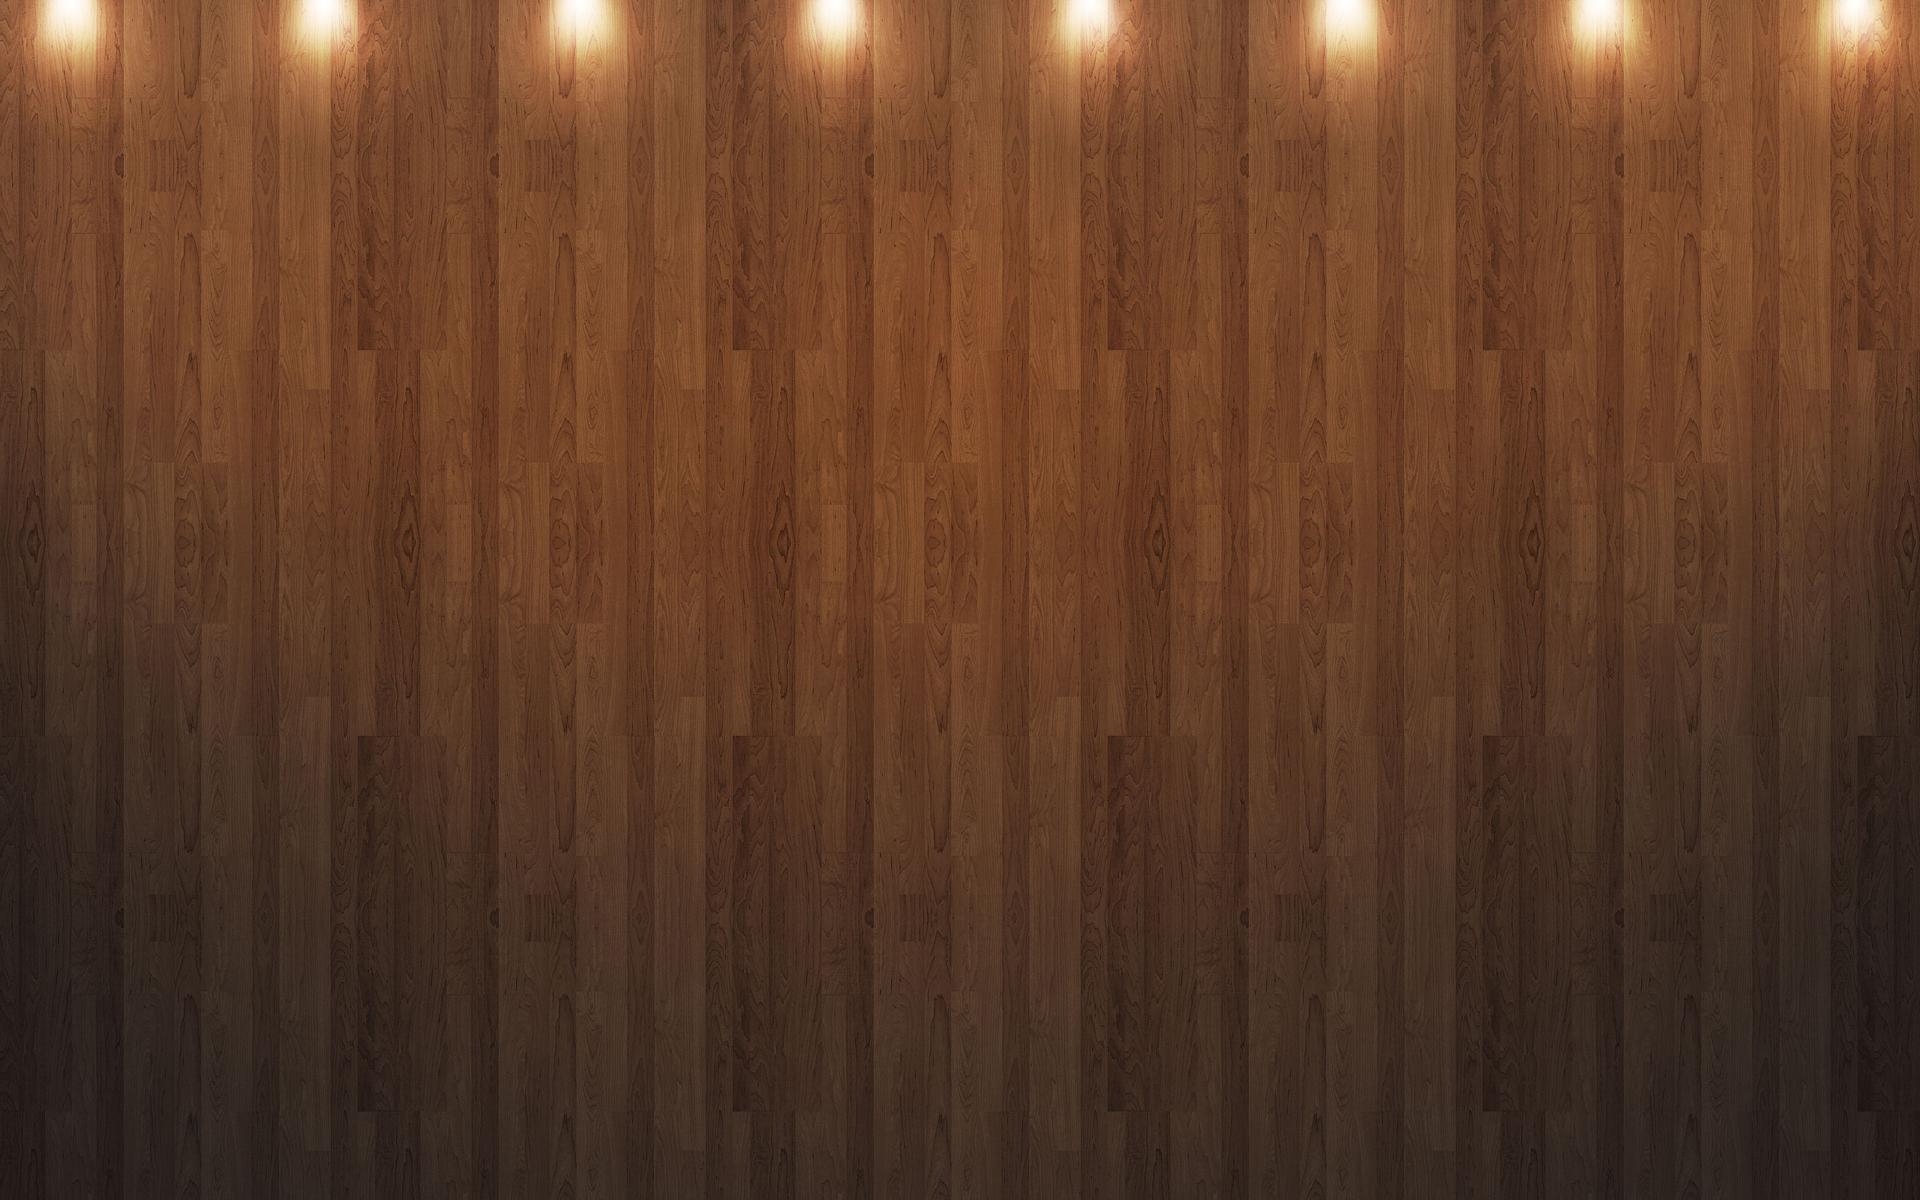 Wallpapers Backgrounds Por Wallpaper Filter Wood Lights 1920x1200